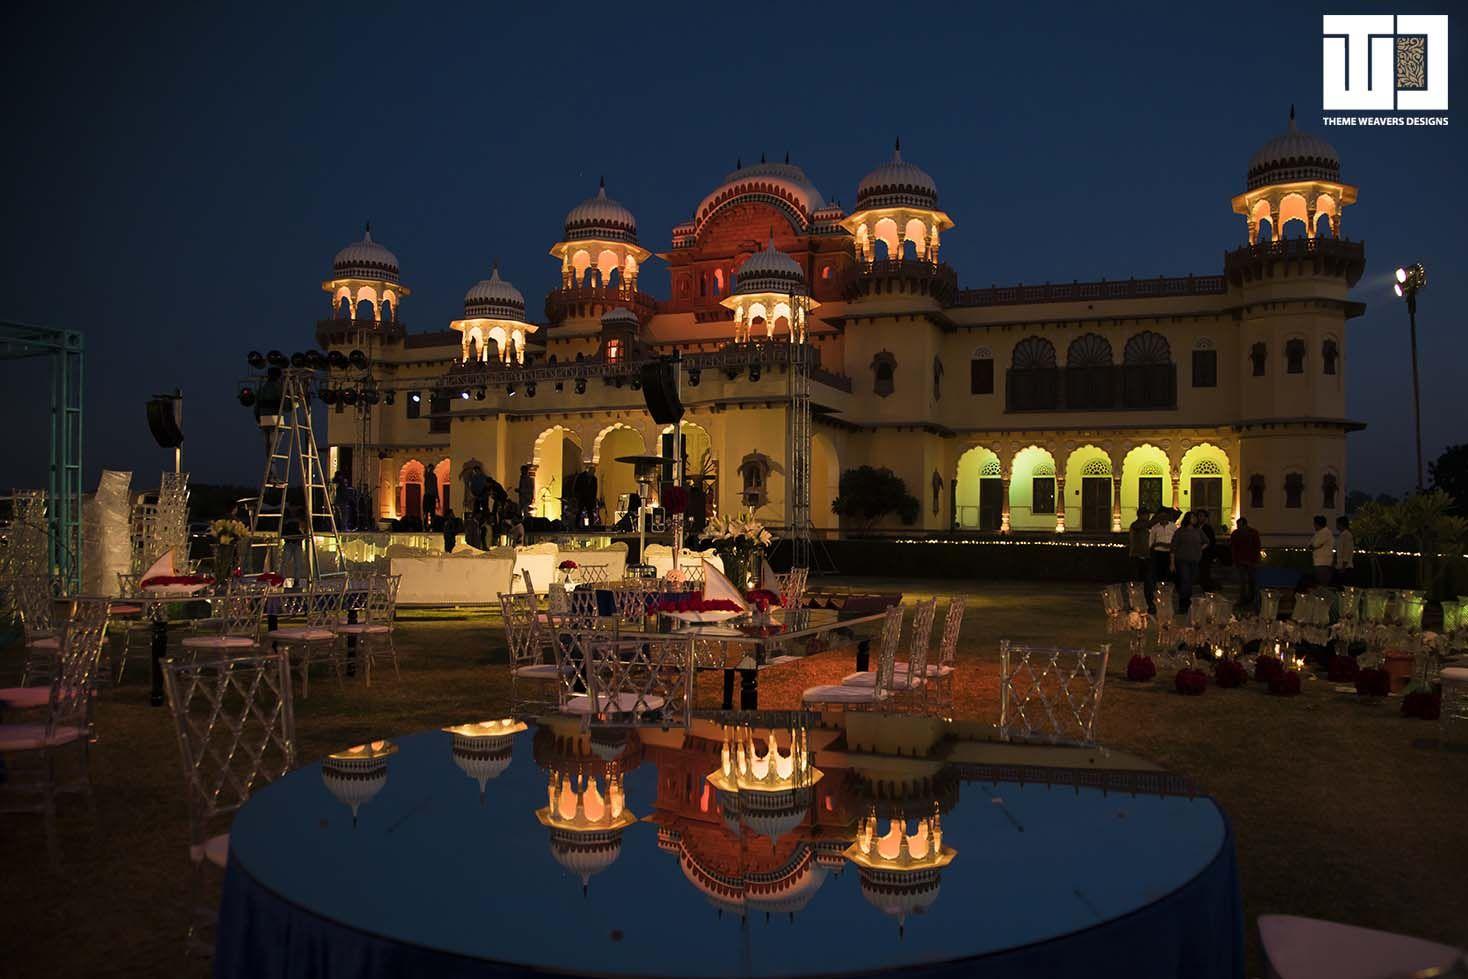 Royal destination wedding in Rajasthan! Heritage property